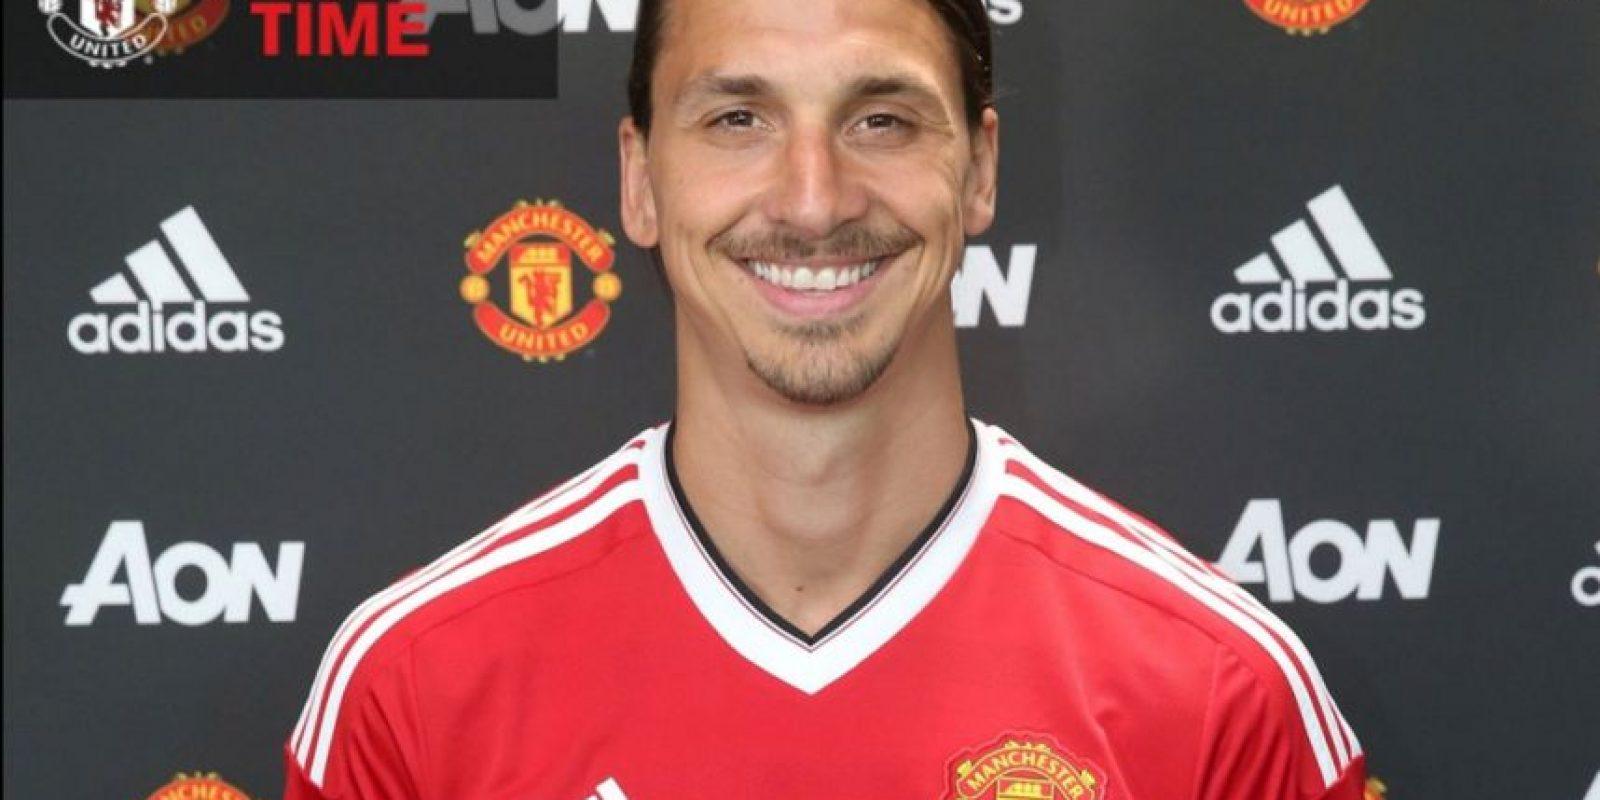 Zlatan Ibrahimovic ha sido el gran fichaje del verano europeo Foto:Twitter Manchester United